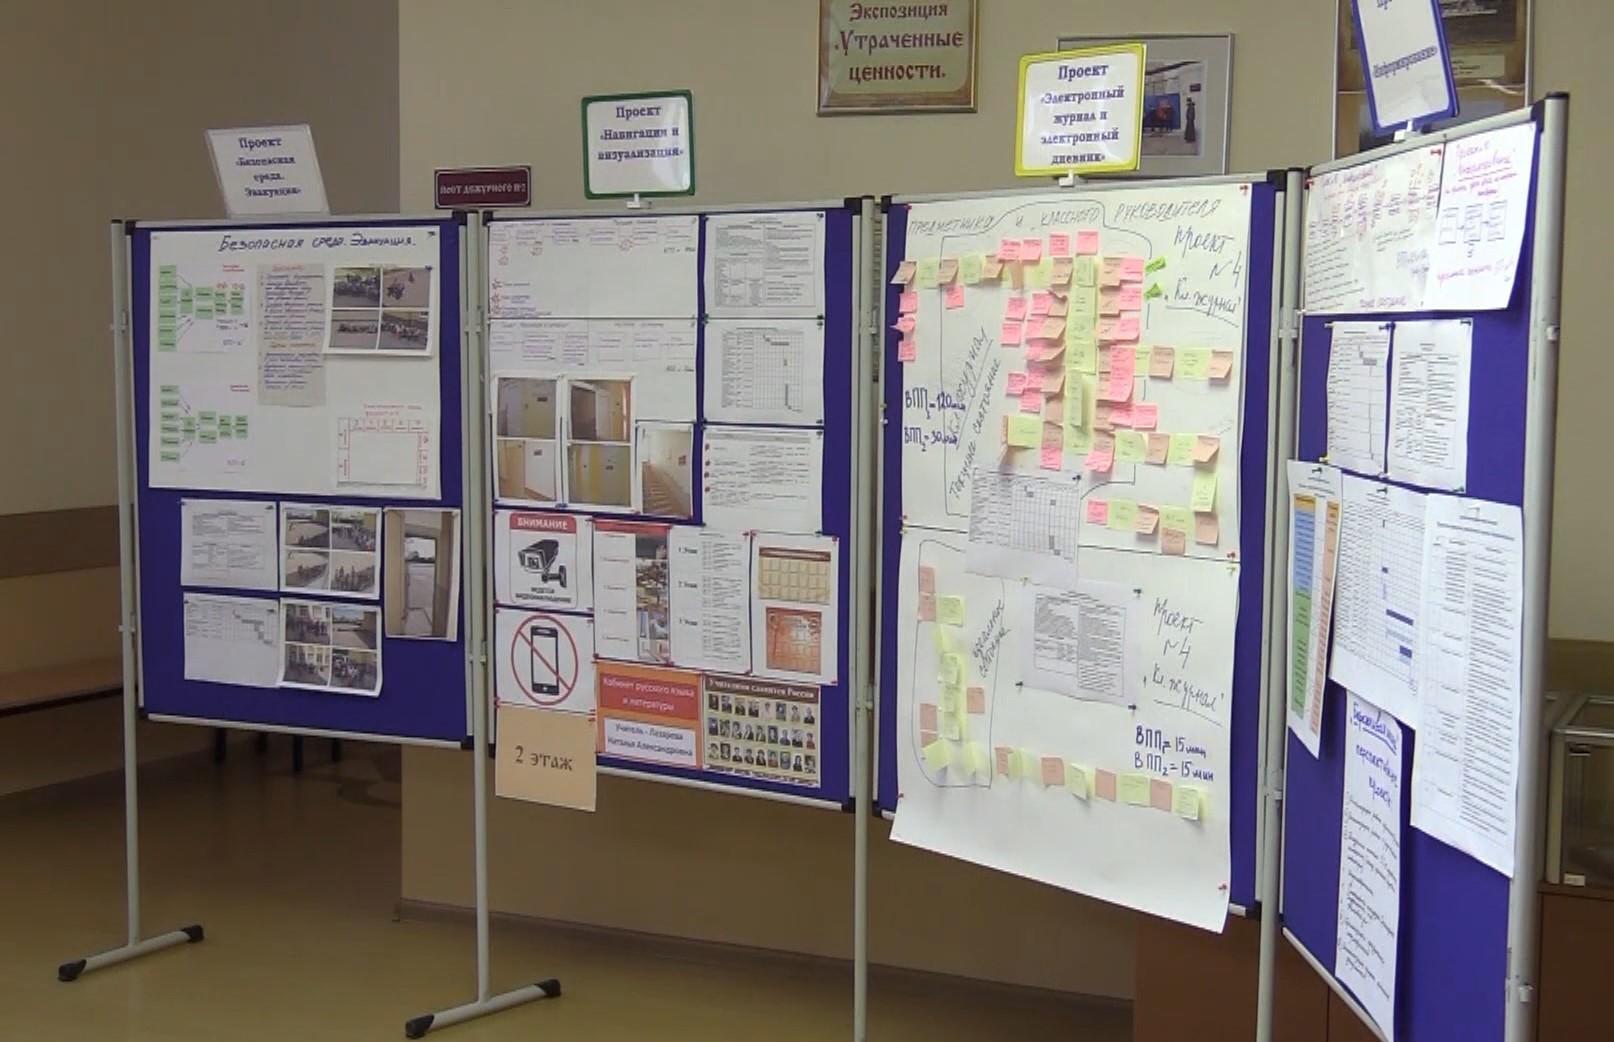 Срок приема заявок на конкурс «Серафимовская школа служения – 2021» продлен до 30 июня